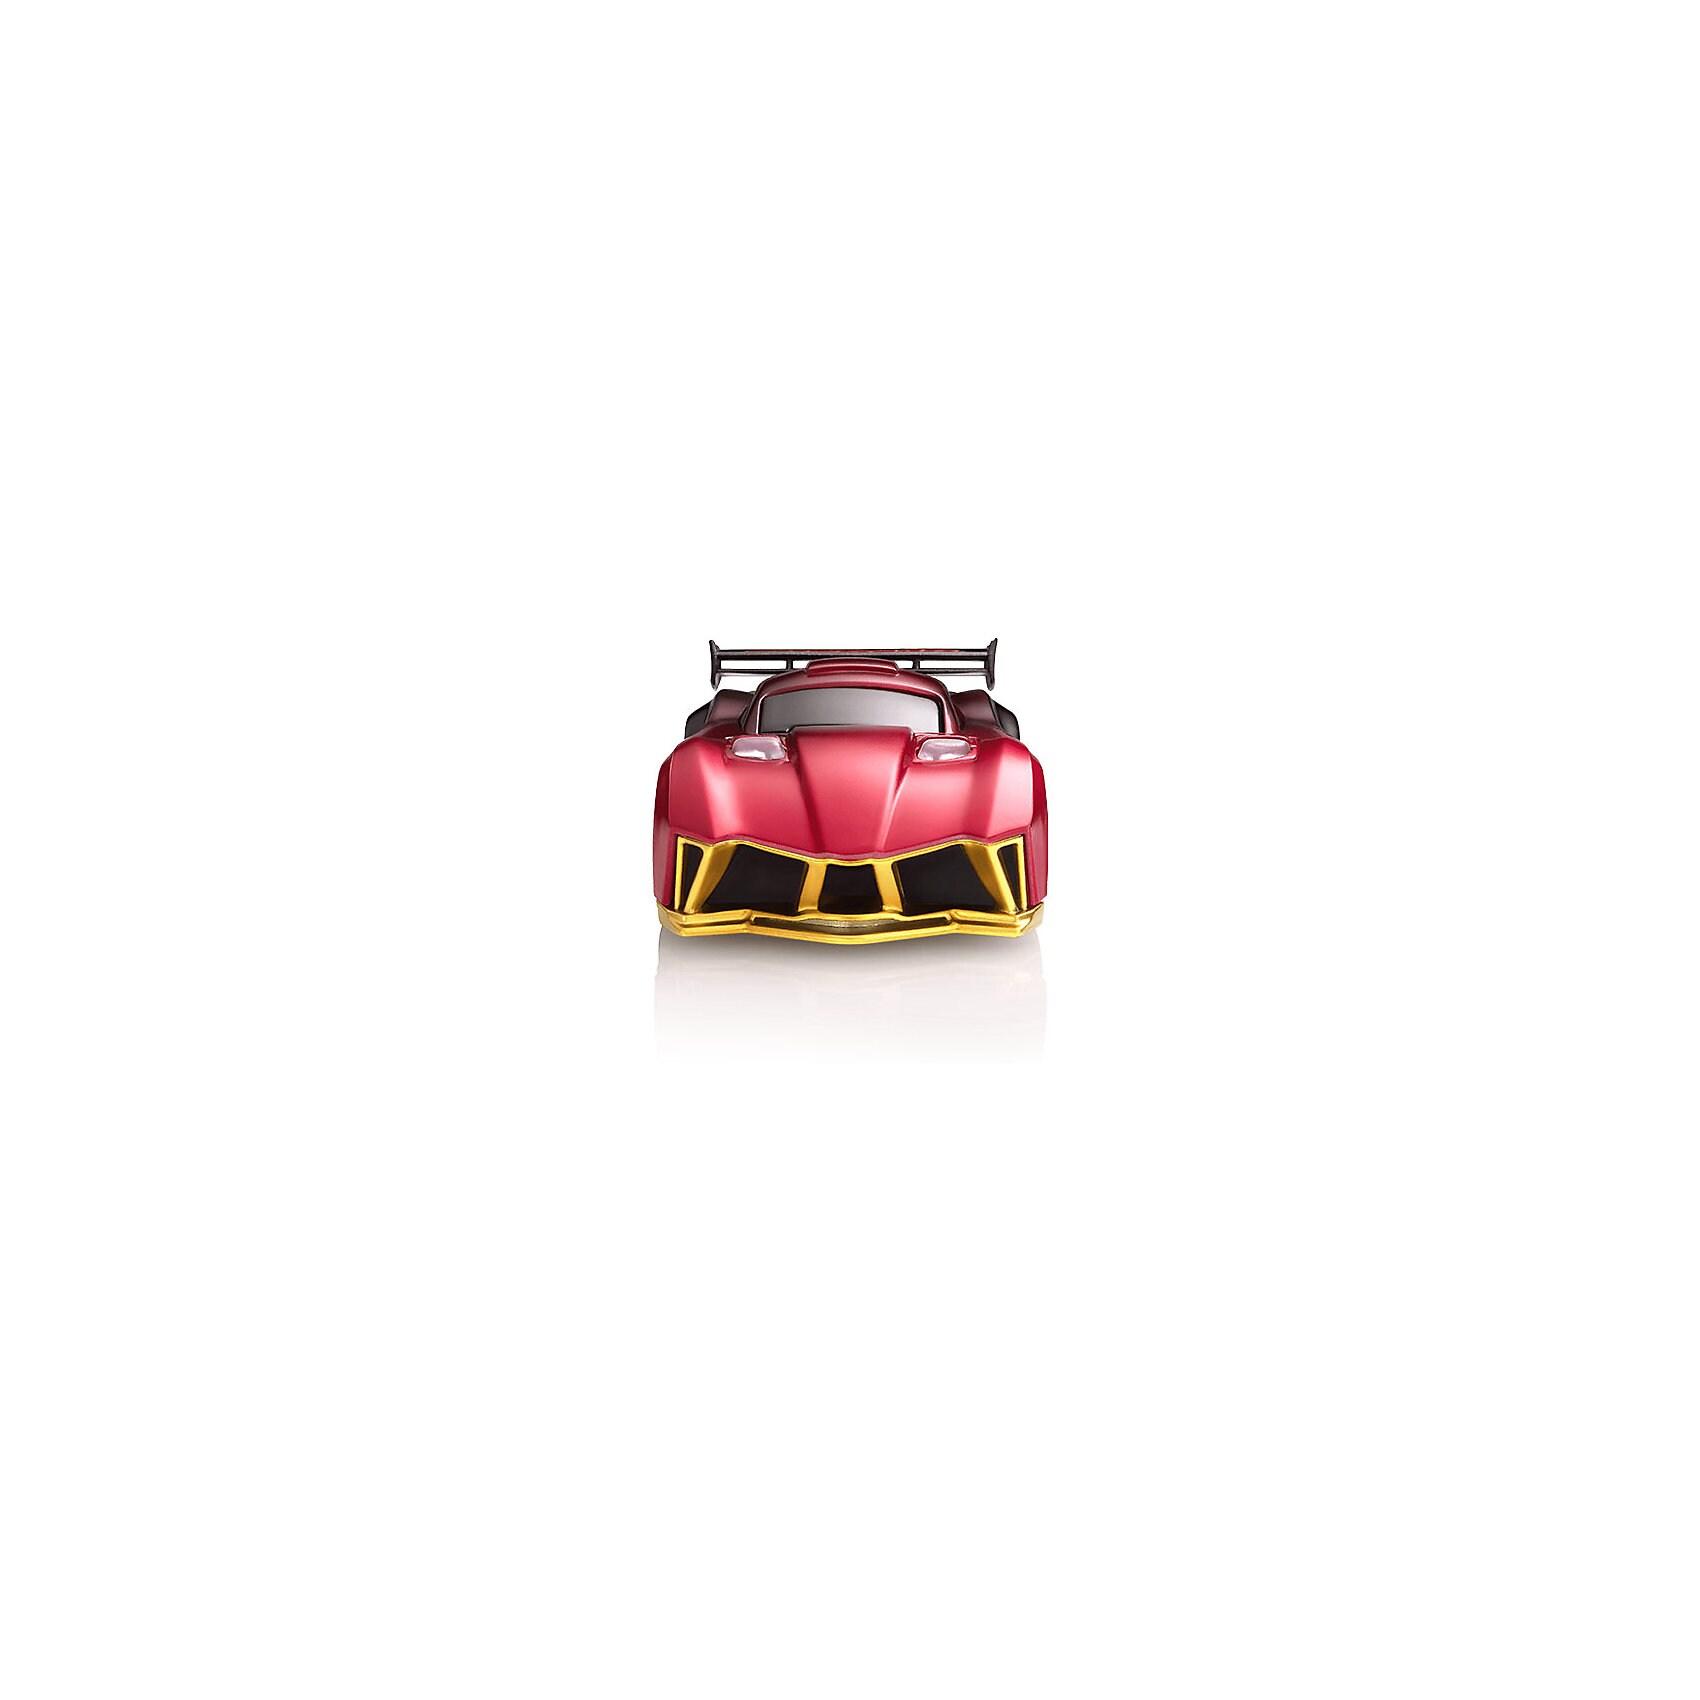 Anki Overdrive Zusatzfahrzeug Thermo